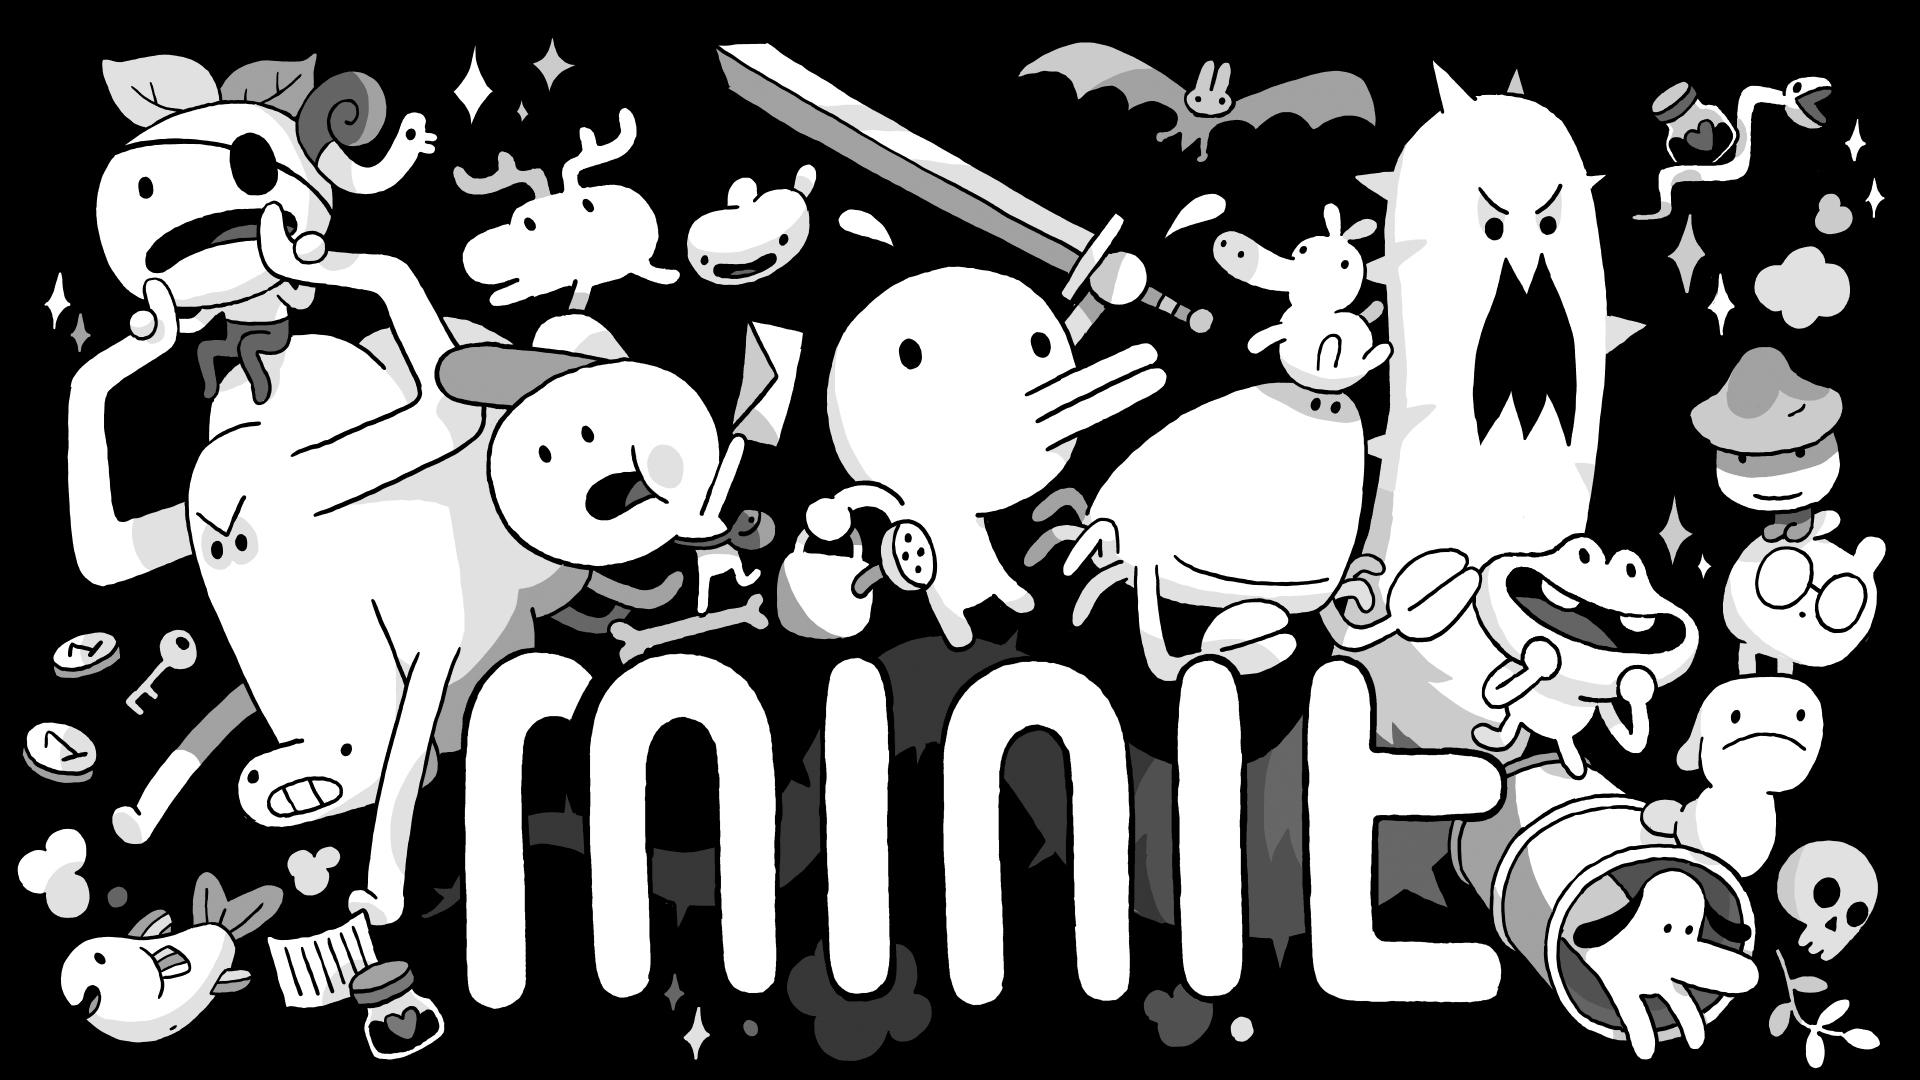 minit-switch-hero